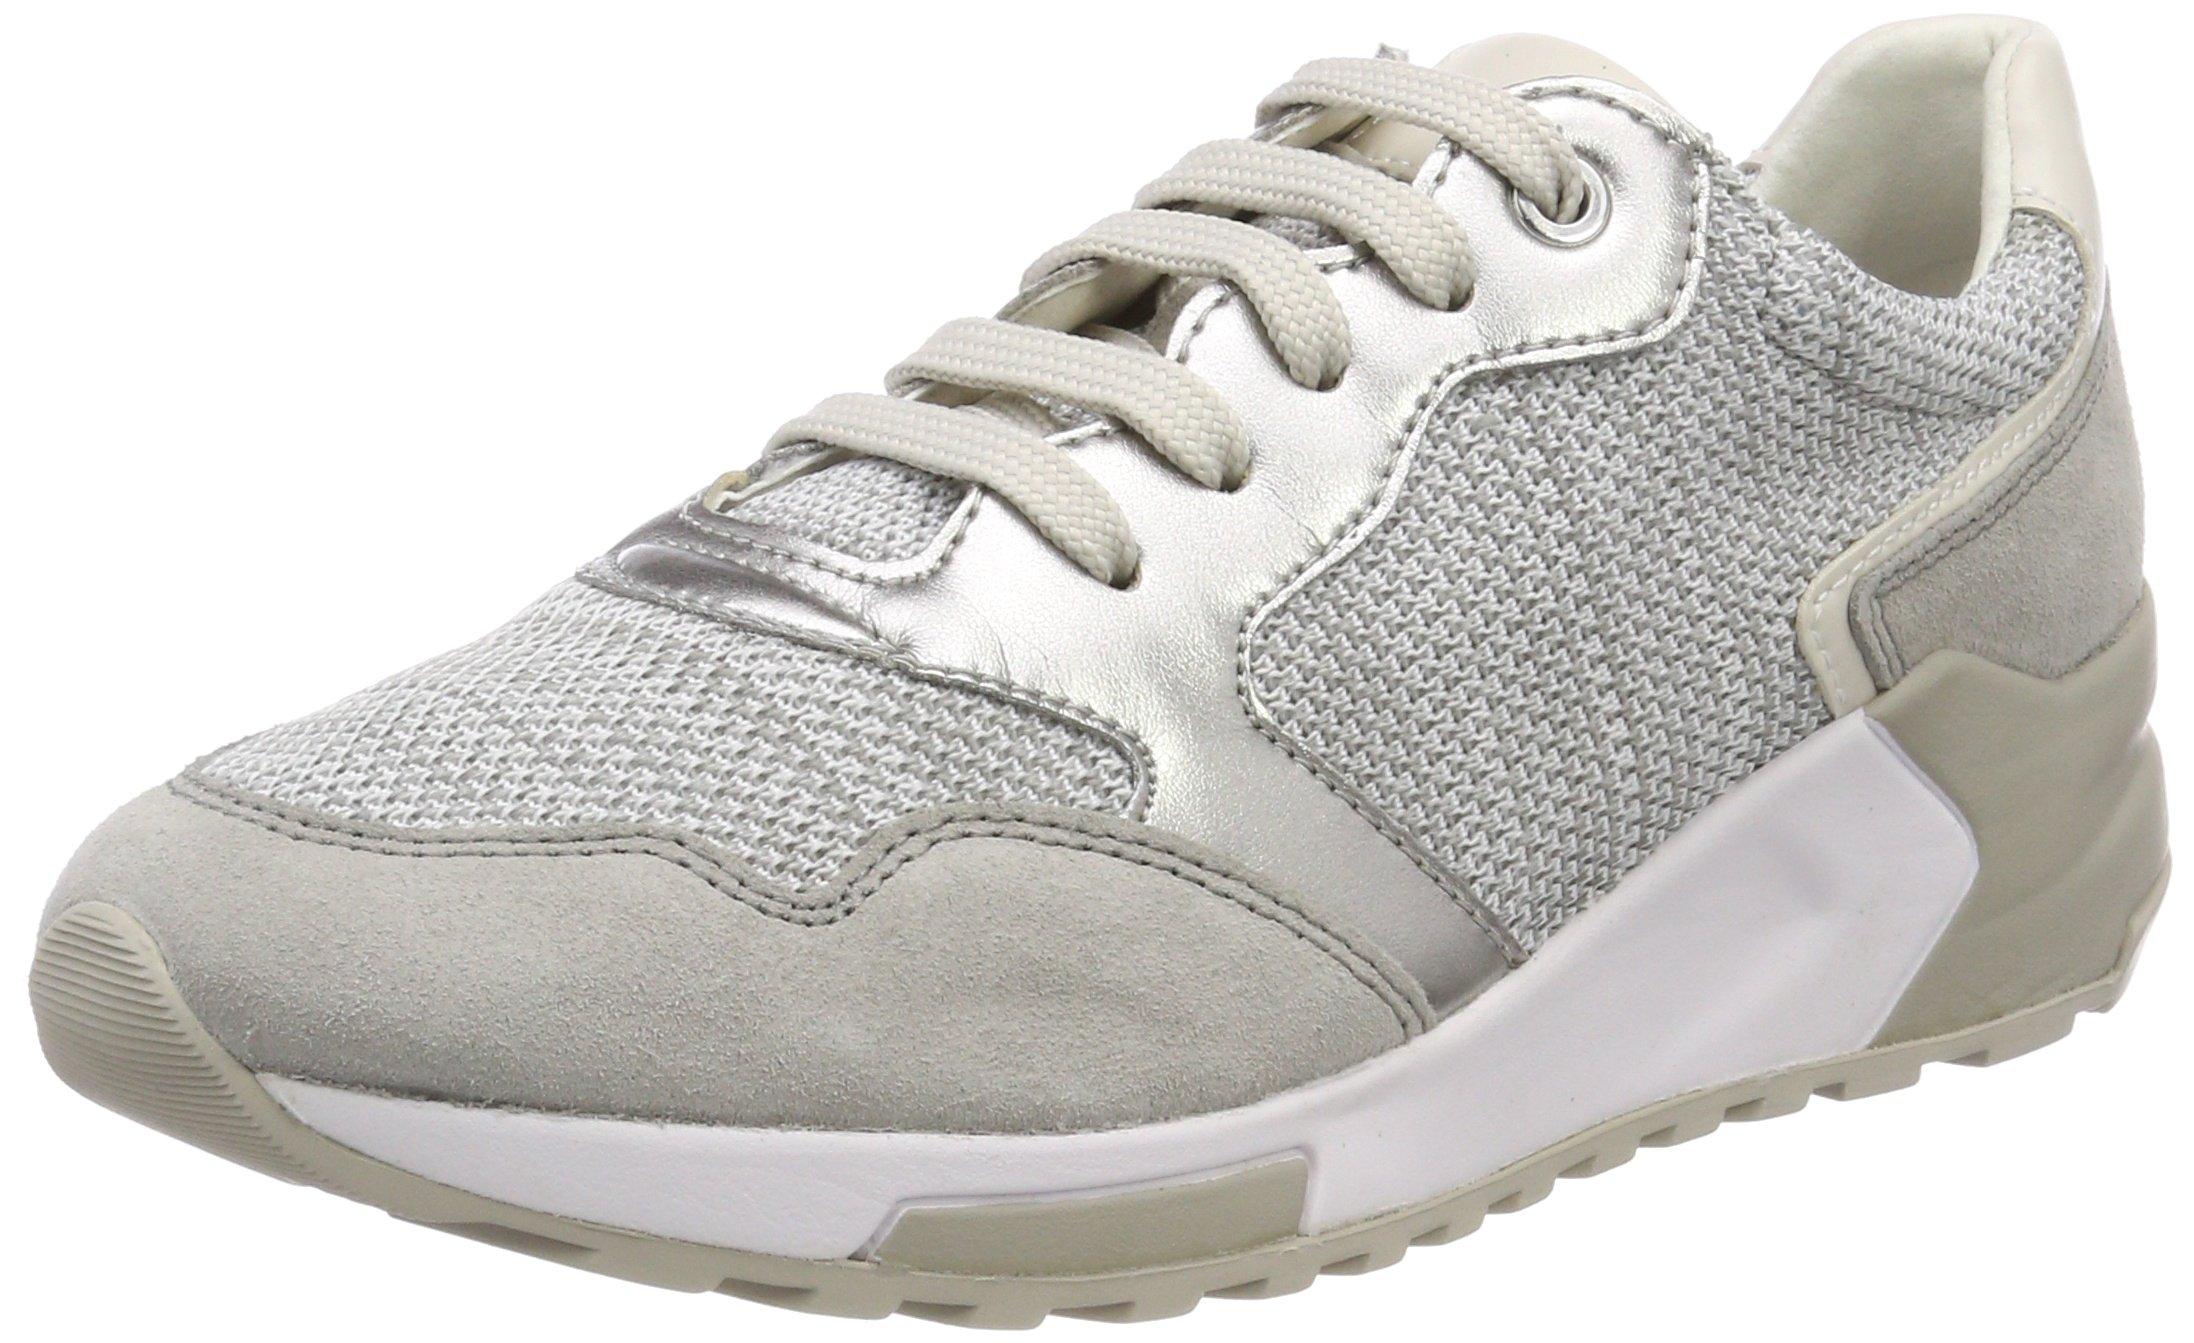 BSneakers Geox FemmeGriswhite Eu lt Basses D Phyteam Grey40 MzVpSU